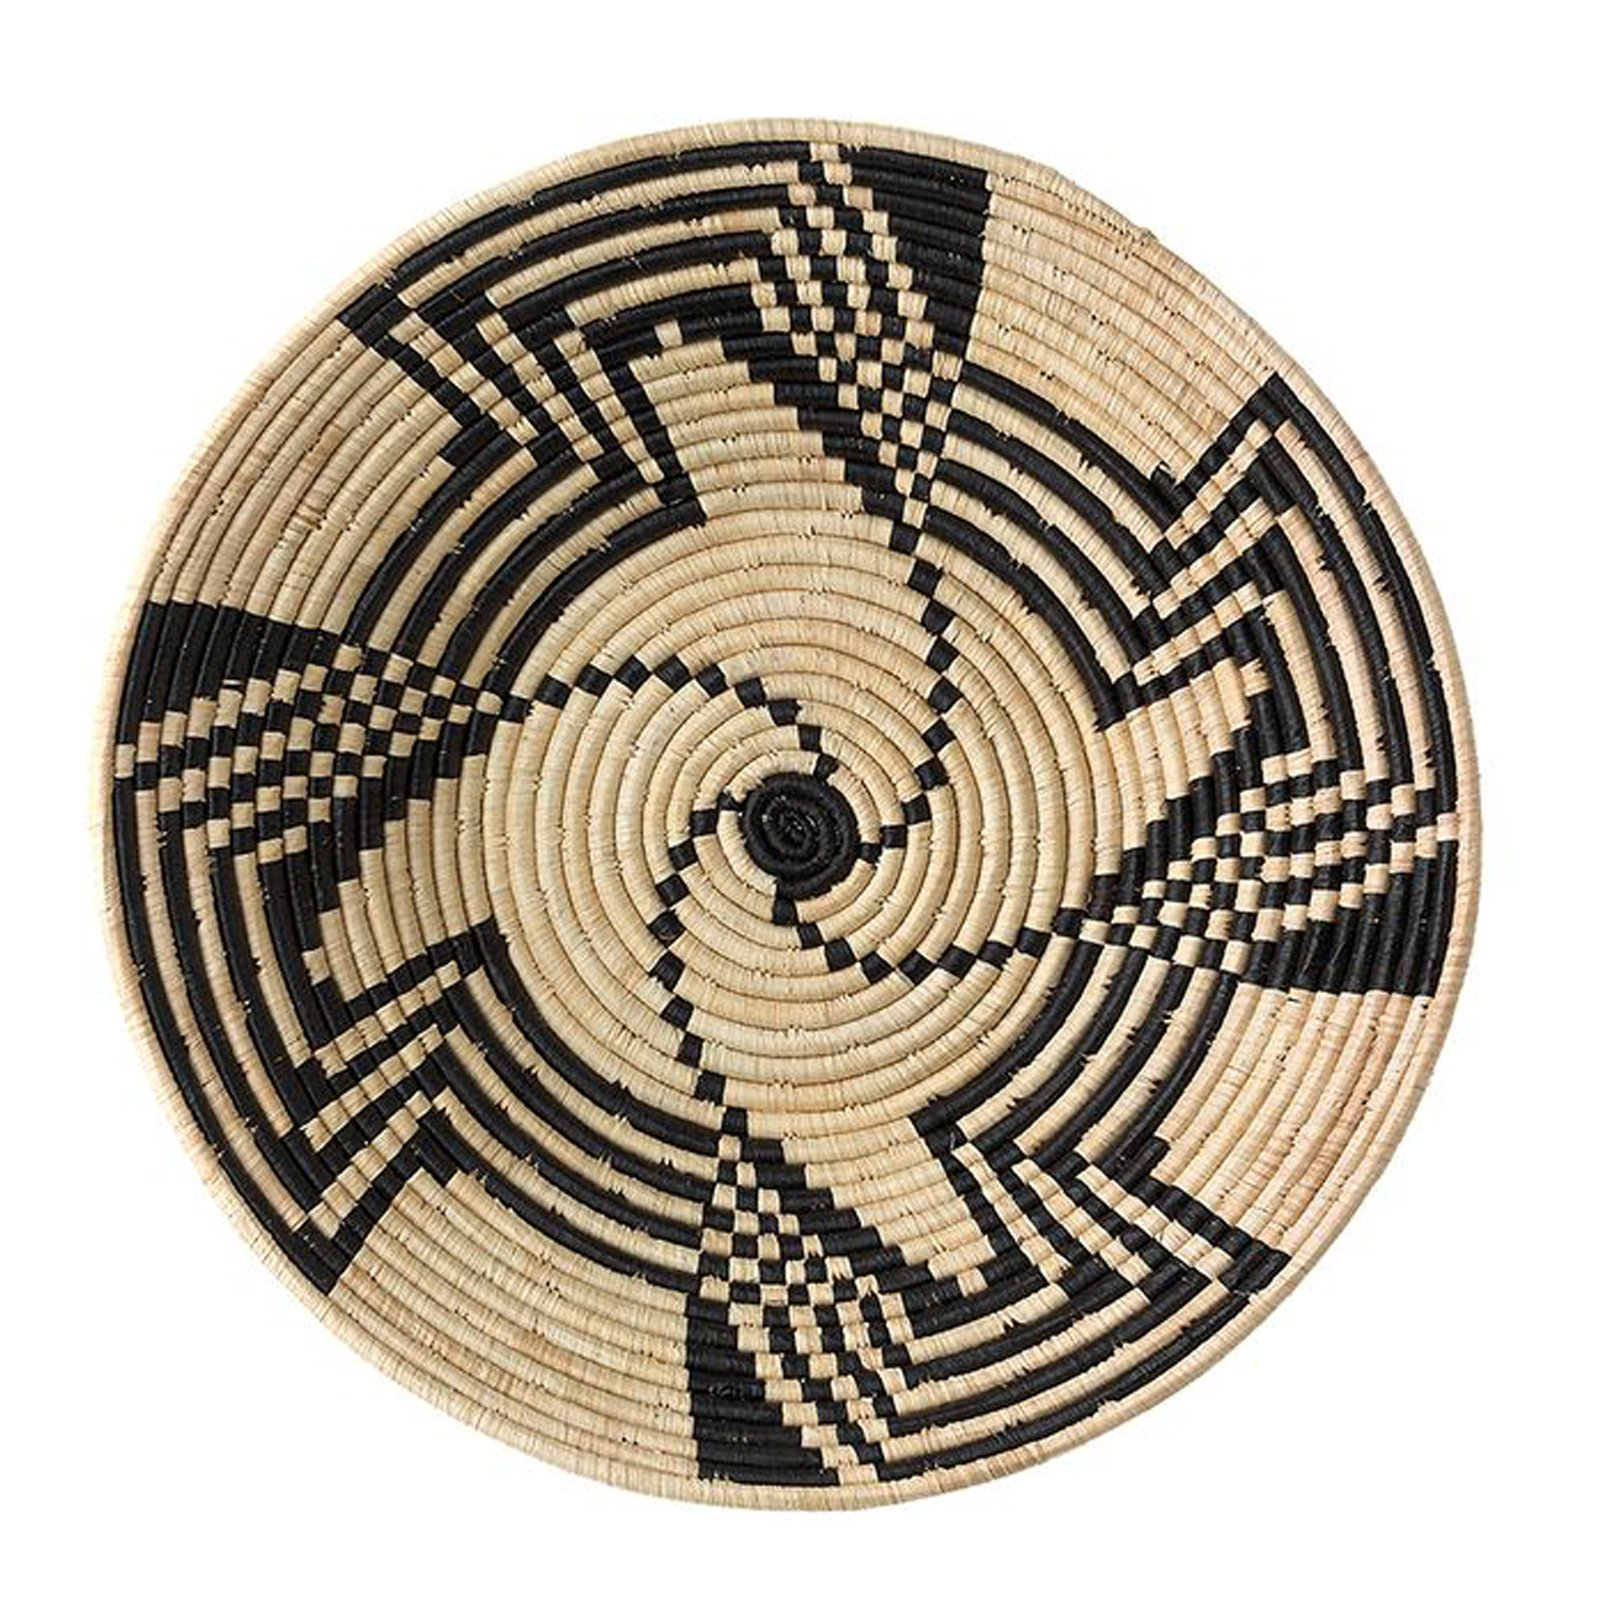 Black Swirl Design Fruit or Display African Basket Handwoven Home Decor